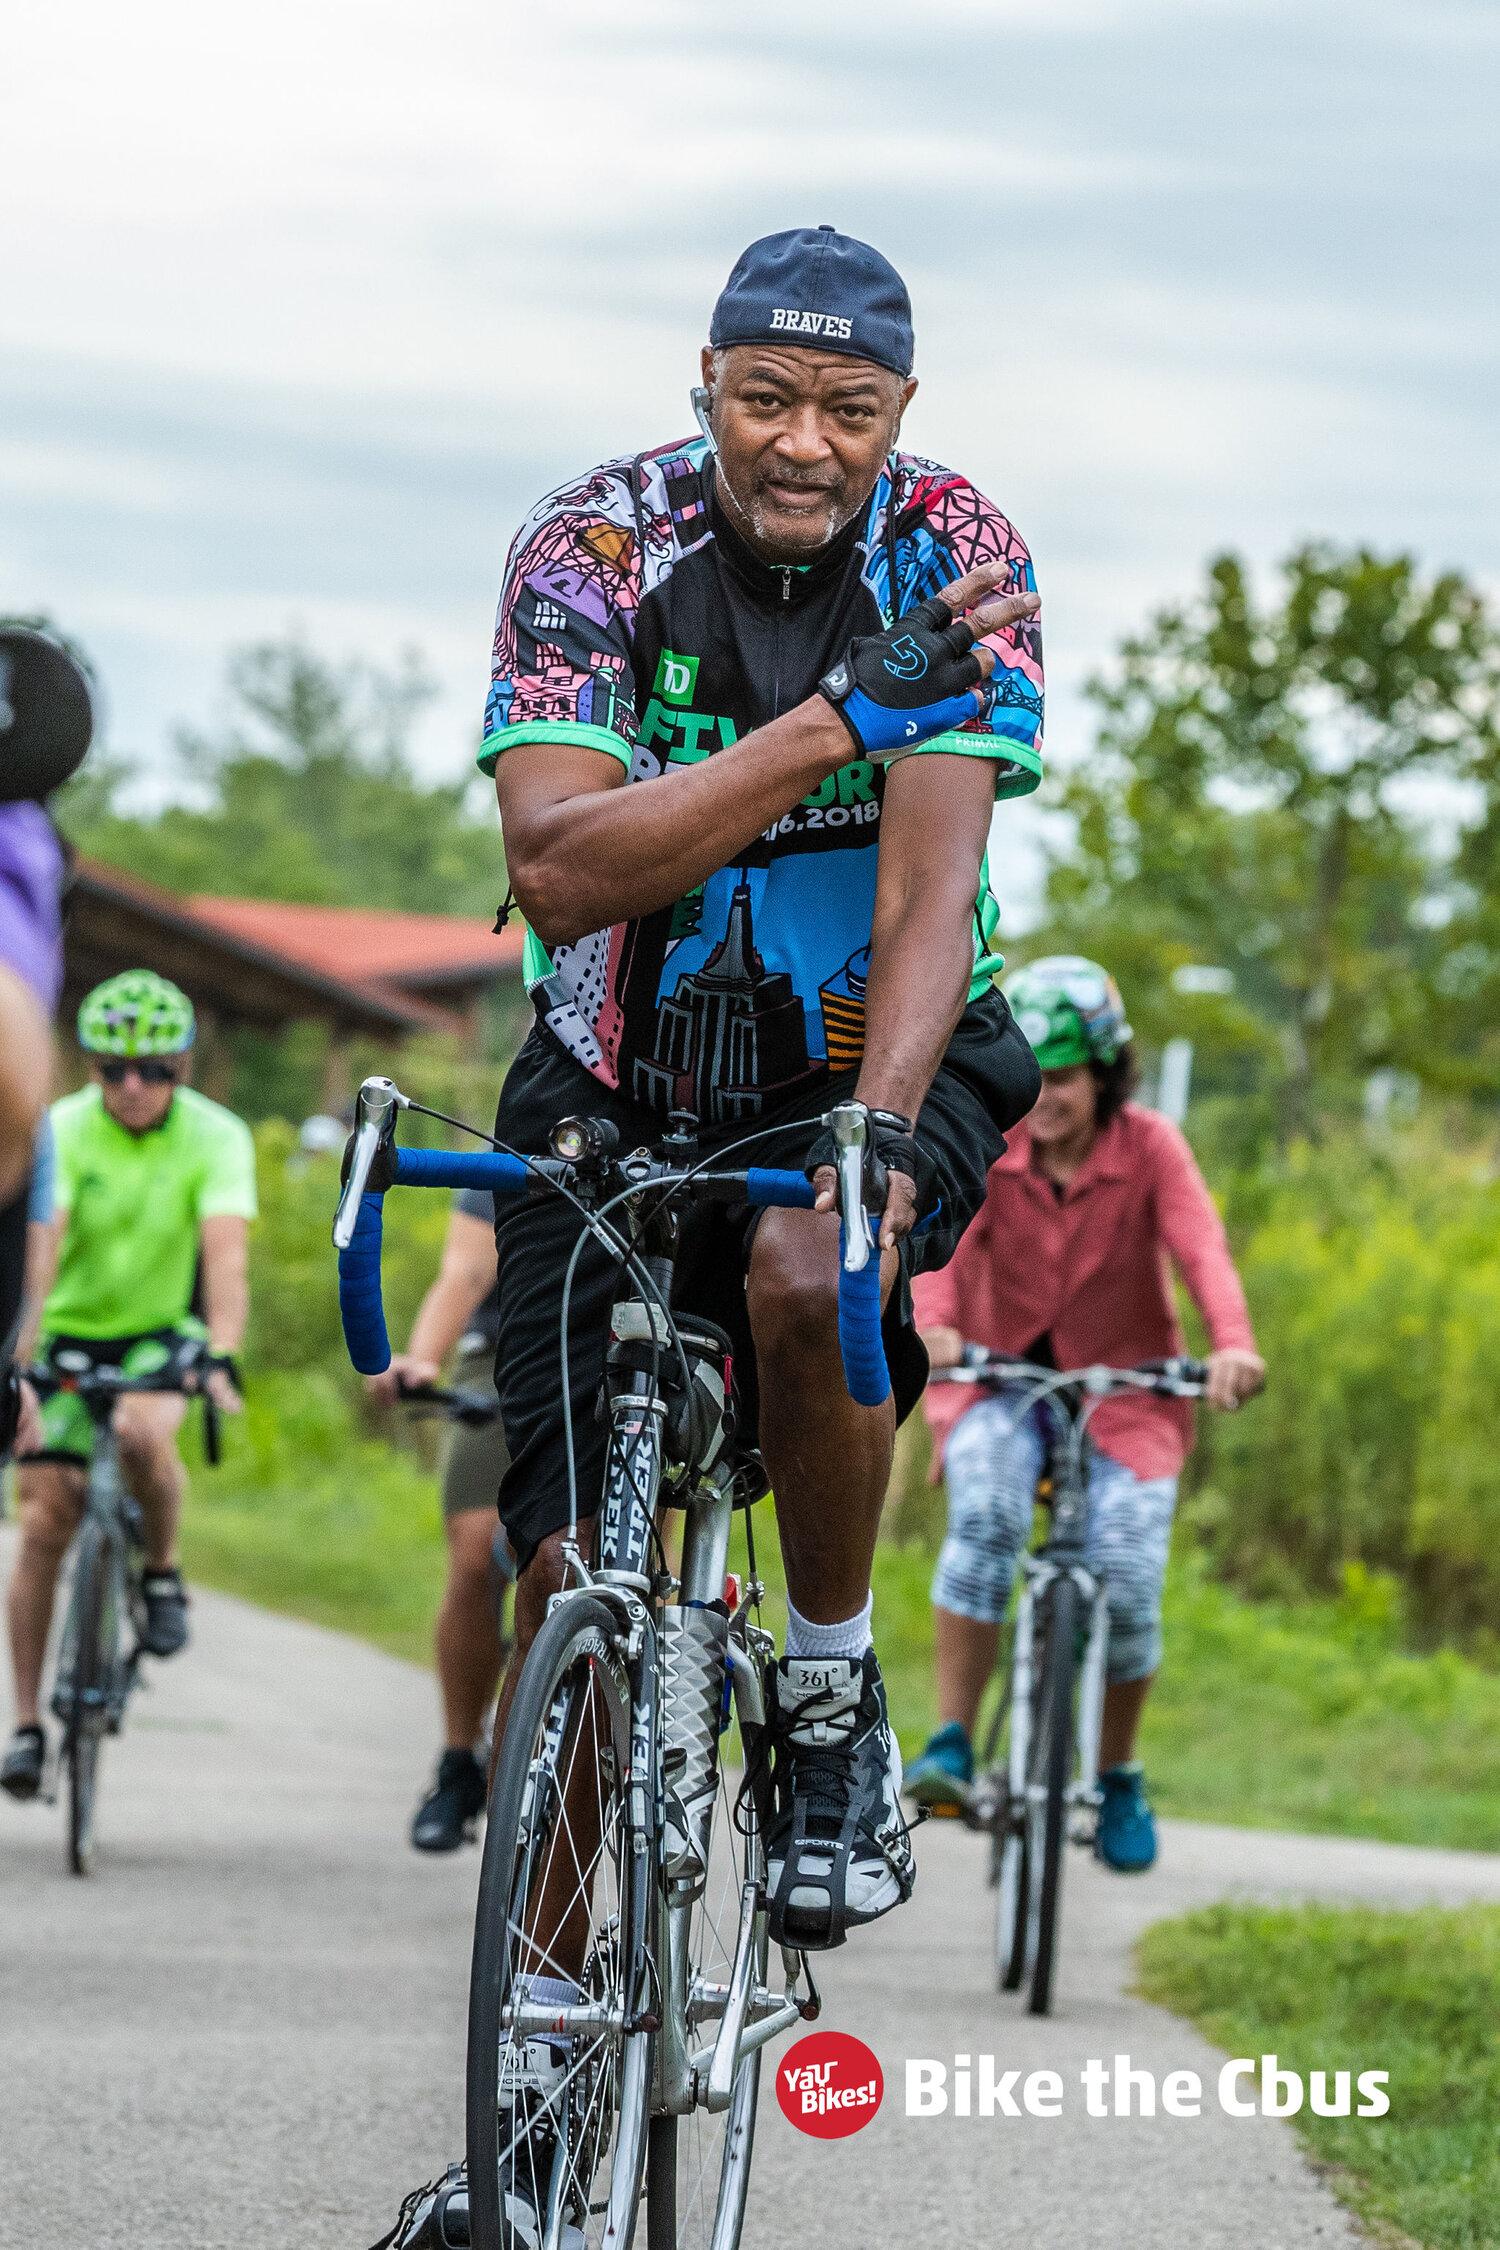 Bike_the_CBUS_1_Course_020.jpg